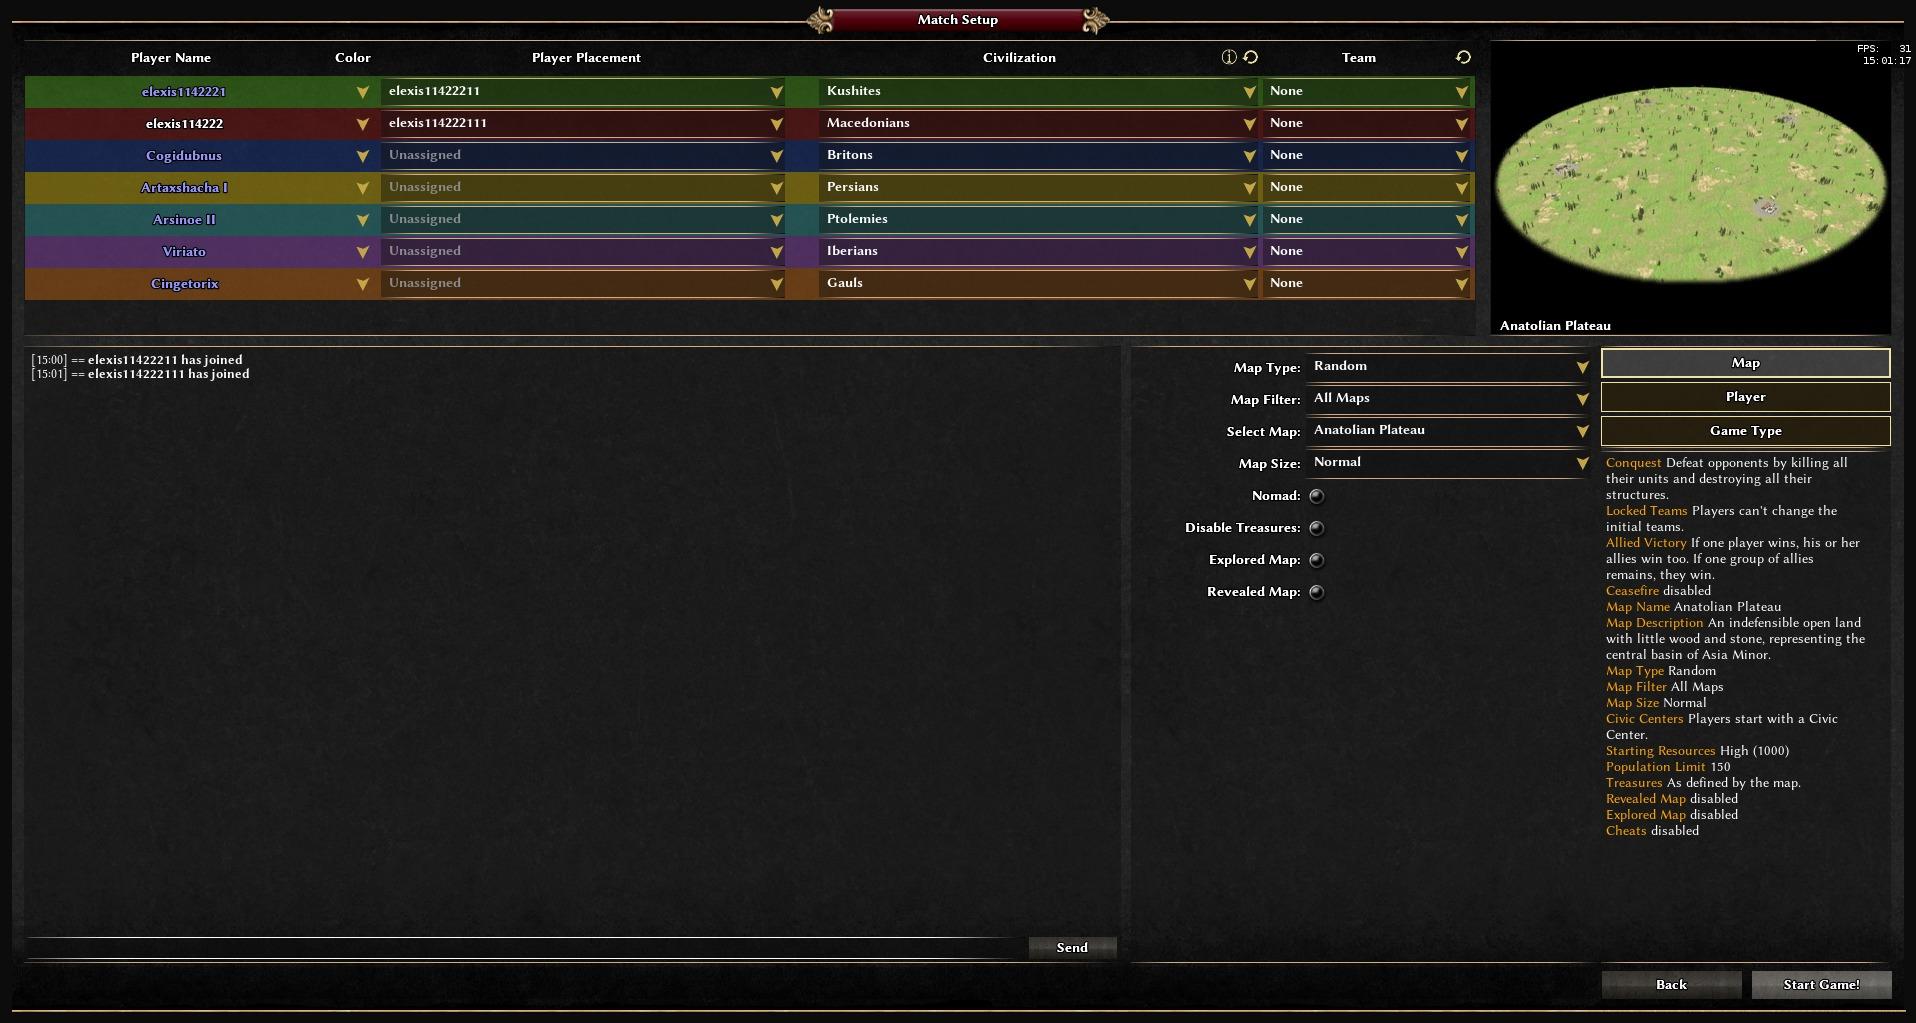 https://trac.wildfiregames.com/raw-attachment/ticket/5206/assignments.jpg